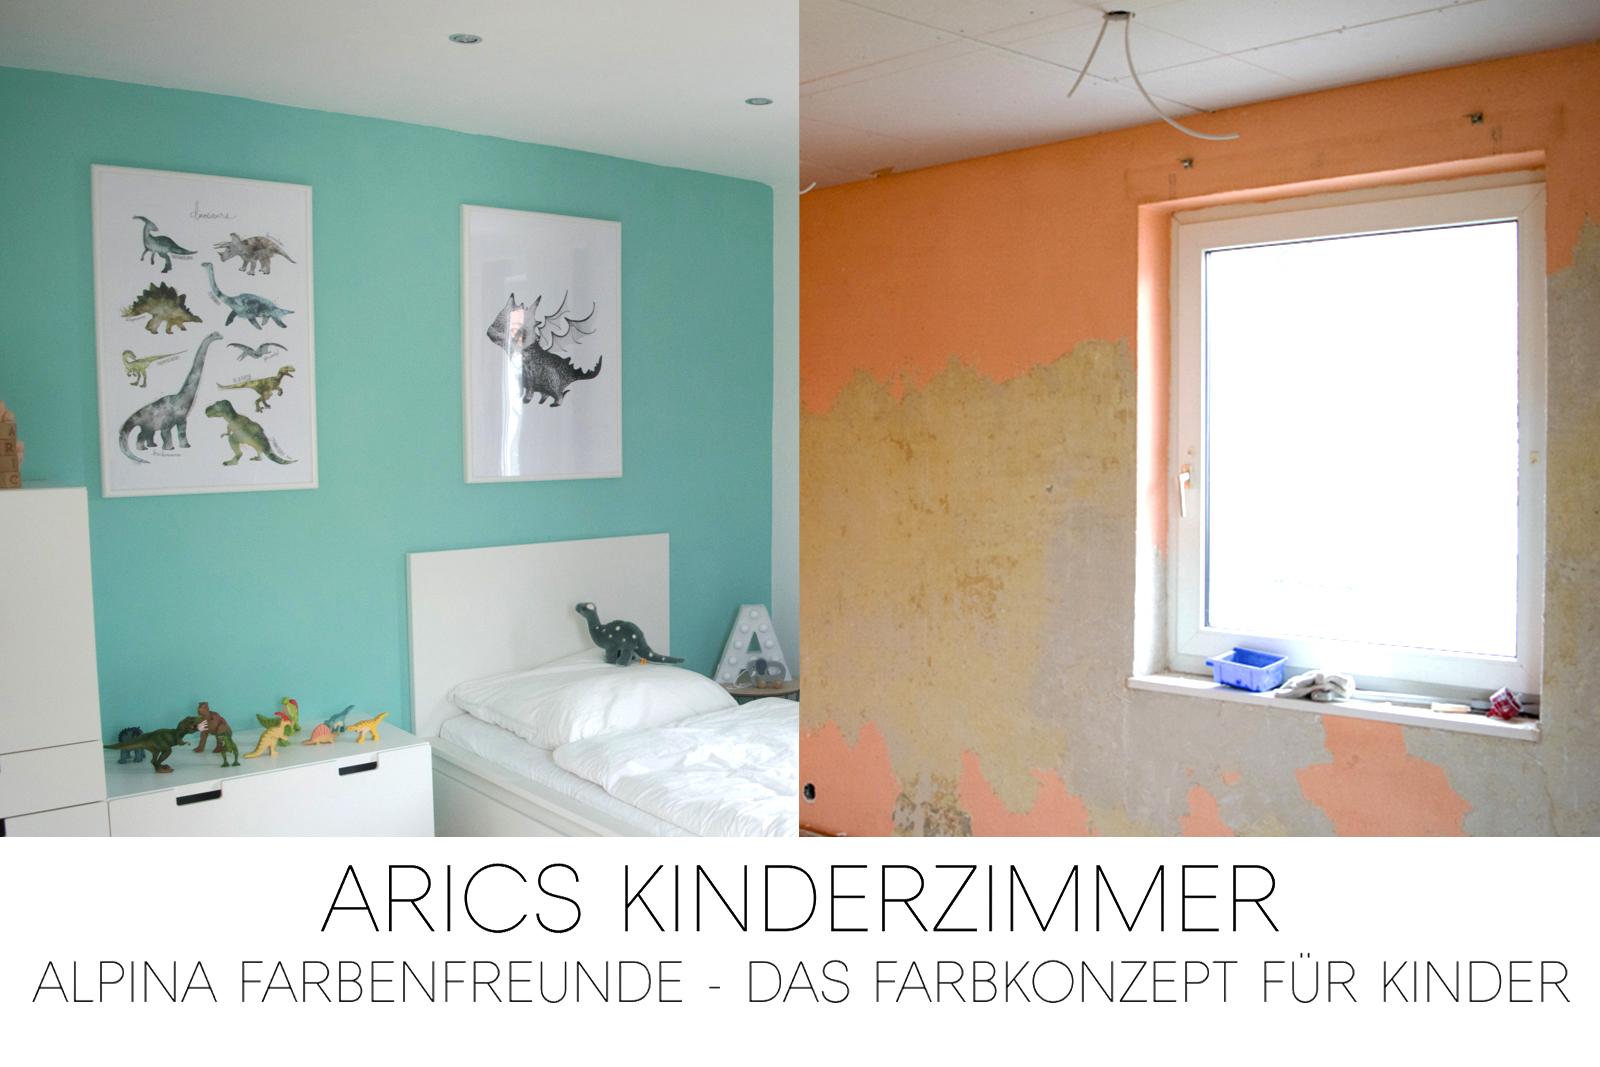 alpina farbenfreunde kinderzimmer farbkonzept geckogrün grün türkis ...